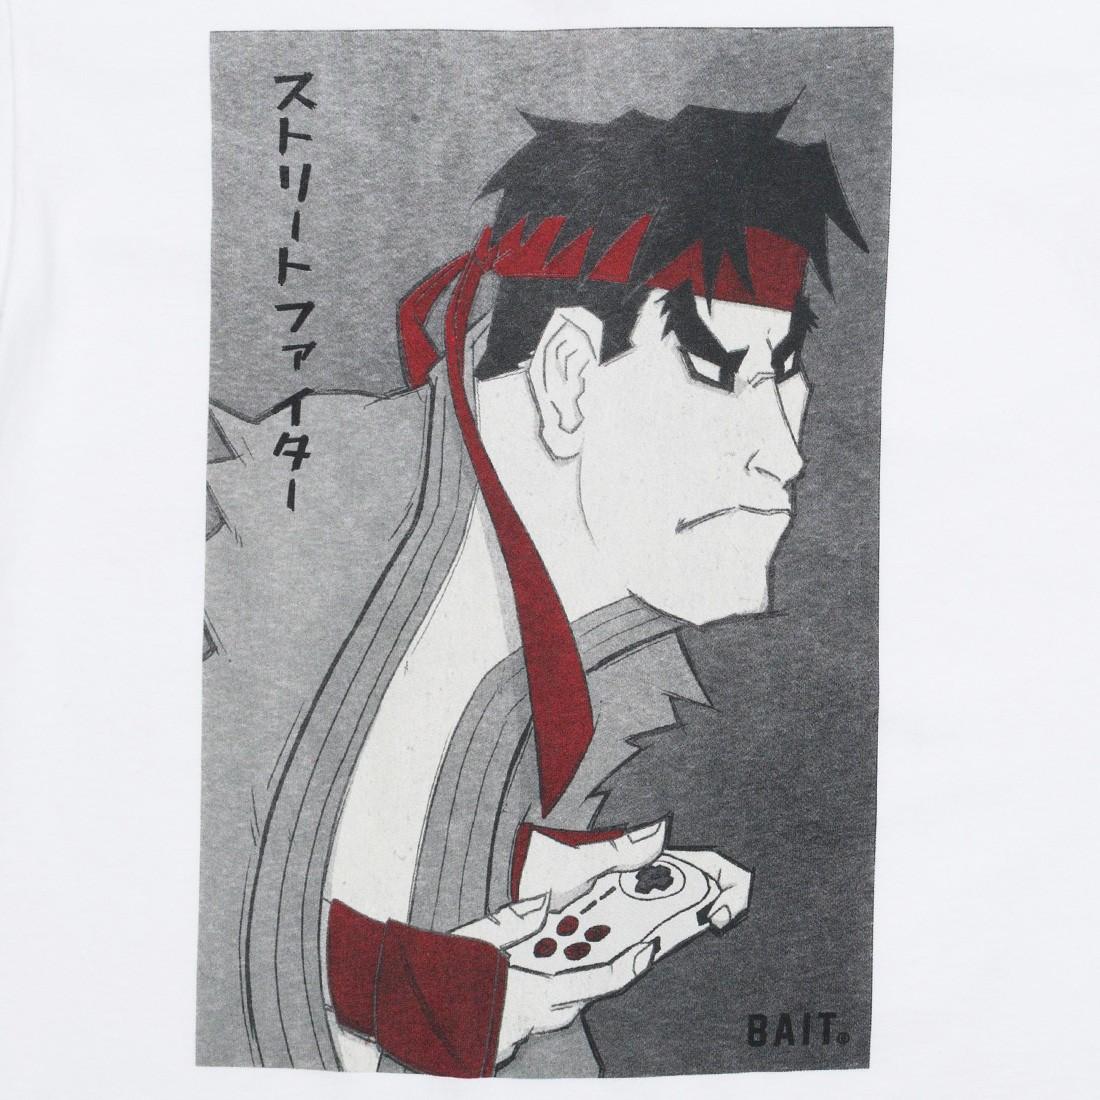 BAIT STREETFIGHTERxKIDOKYO RYU SS - 197-STF-TEE-001